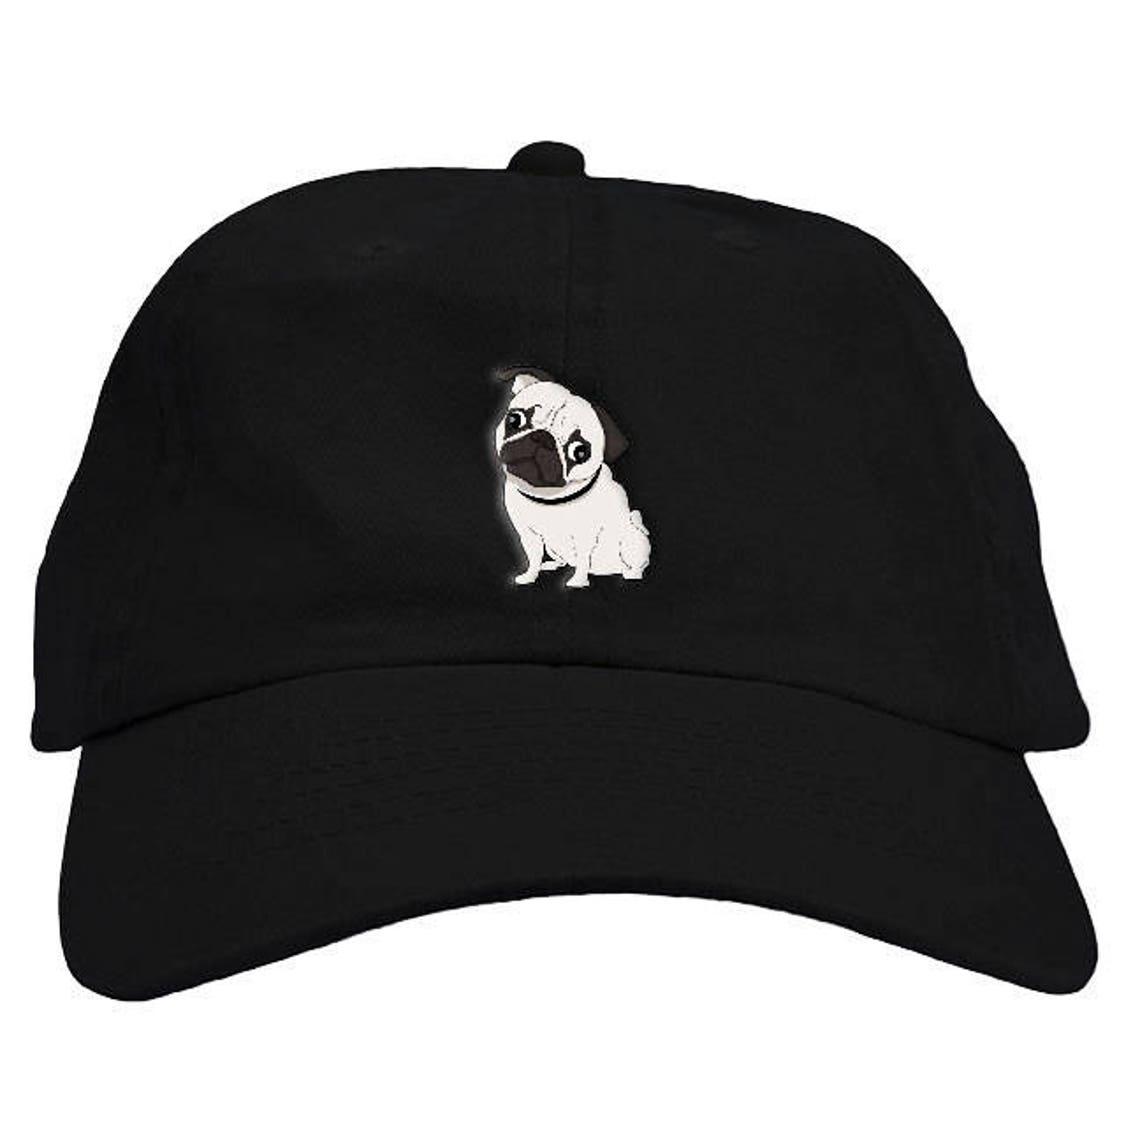 4a93109c9f4 Pug Dad Hat Baseball Cap Low Profile